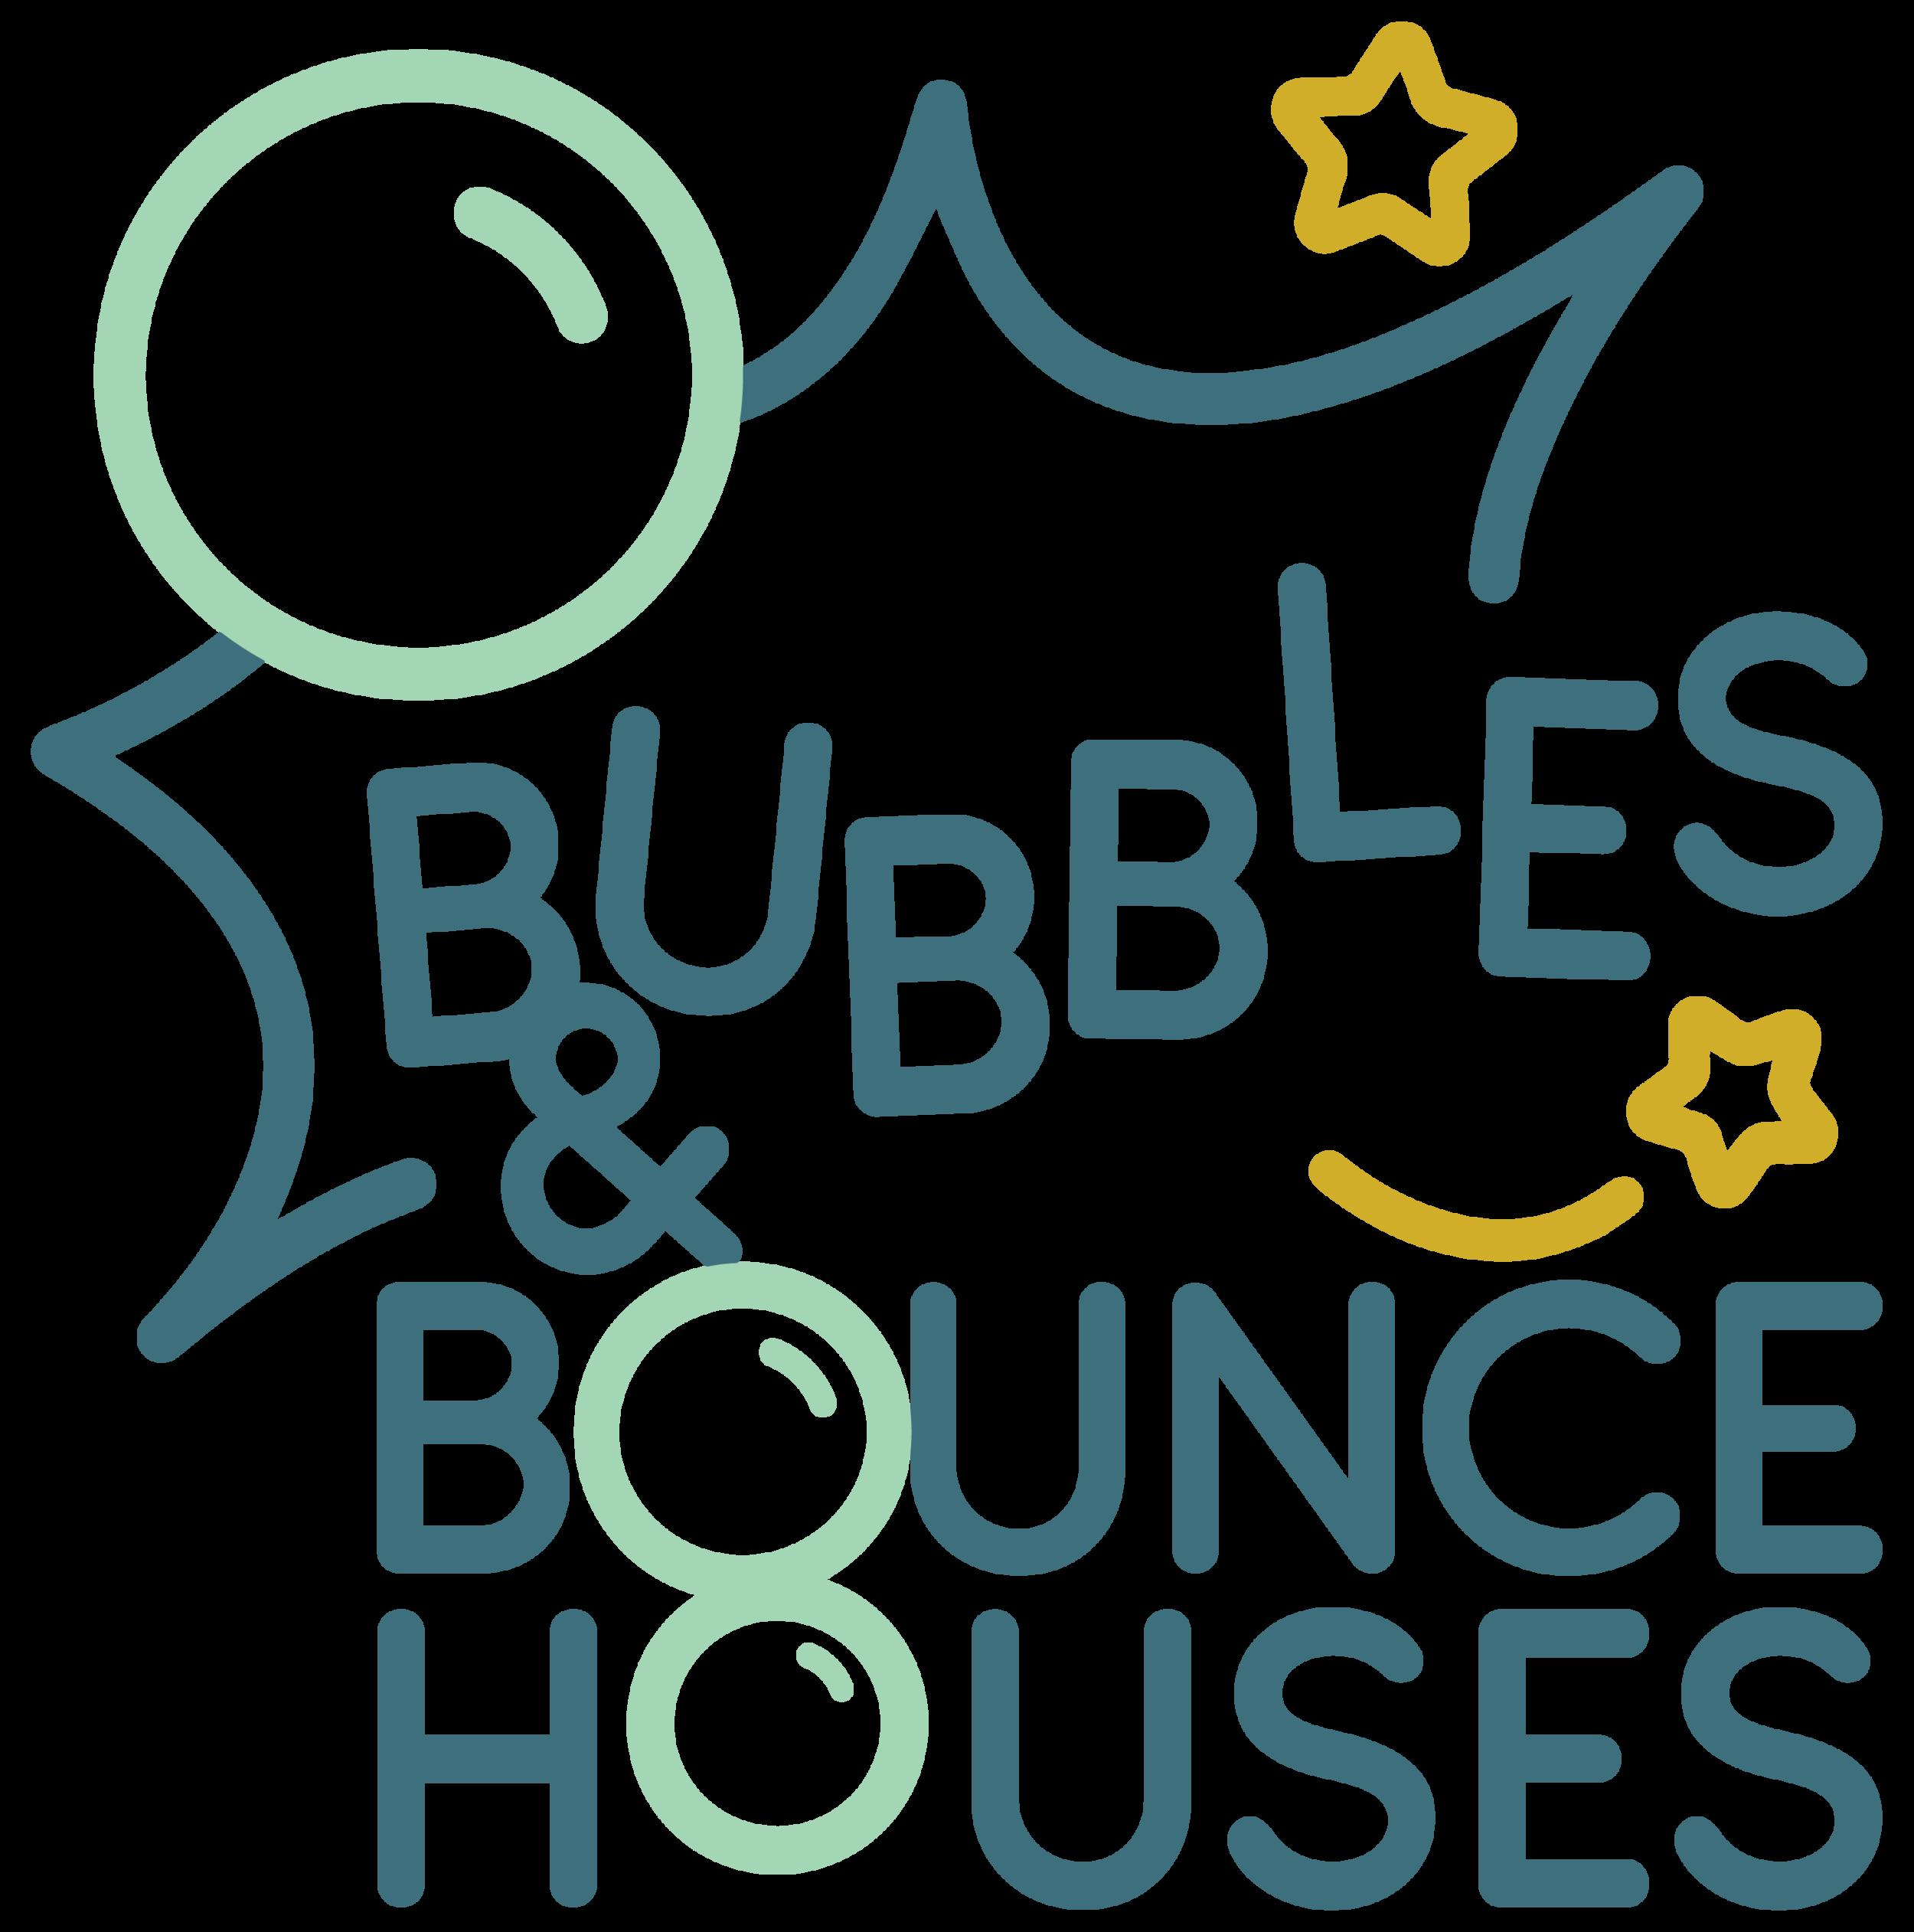 bubbles_bh-02.png